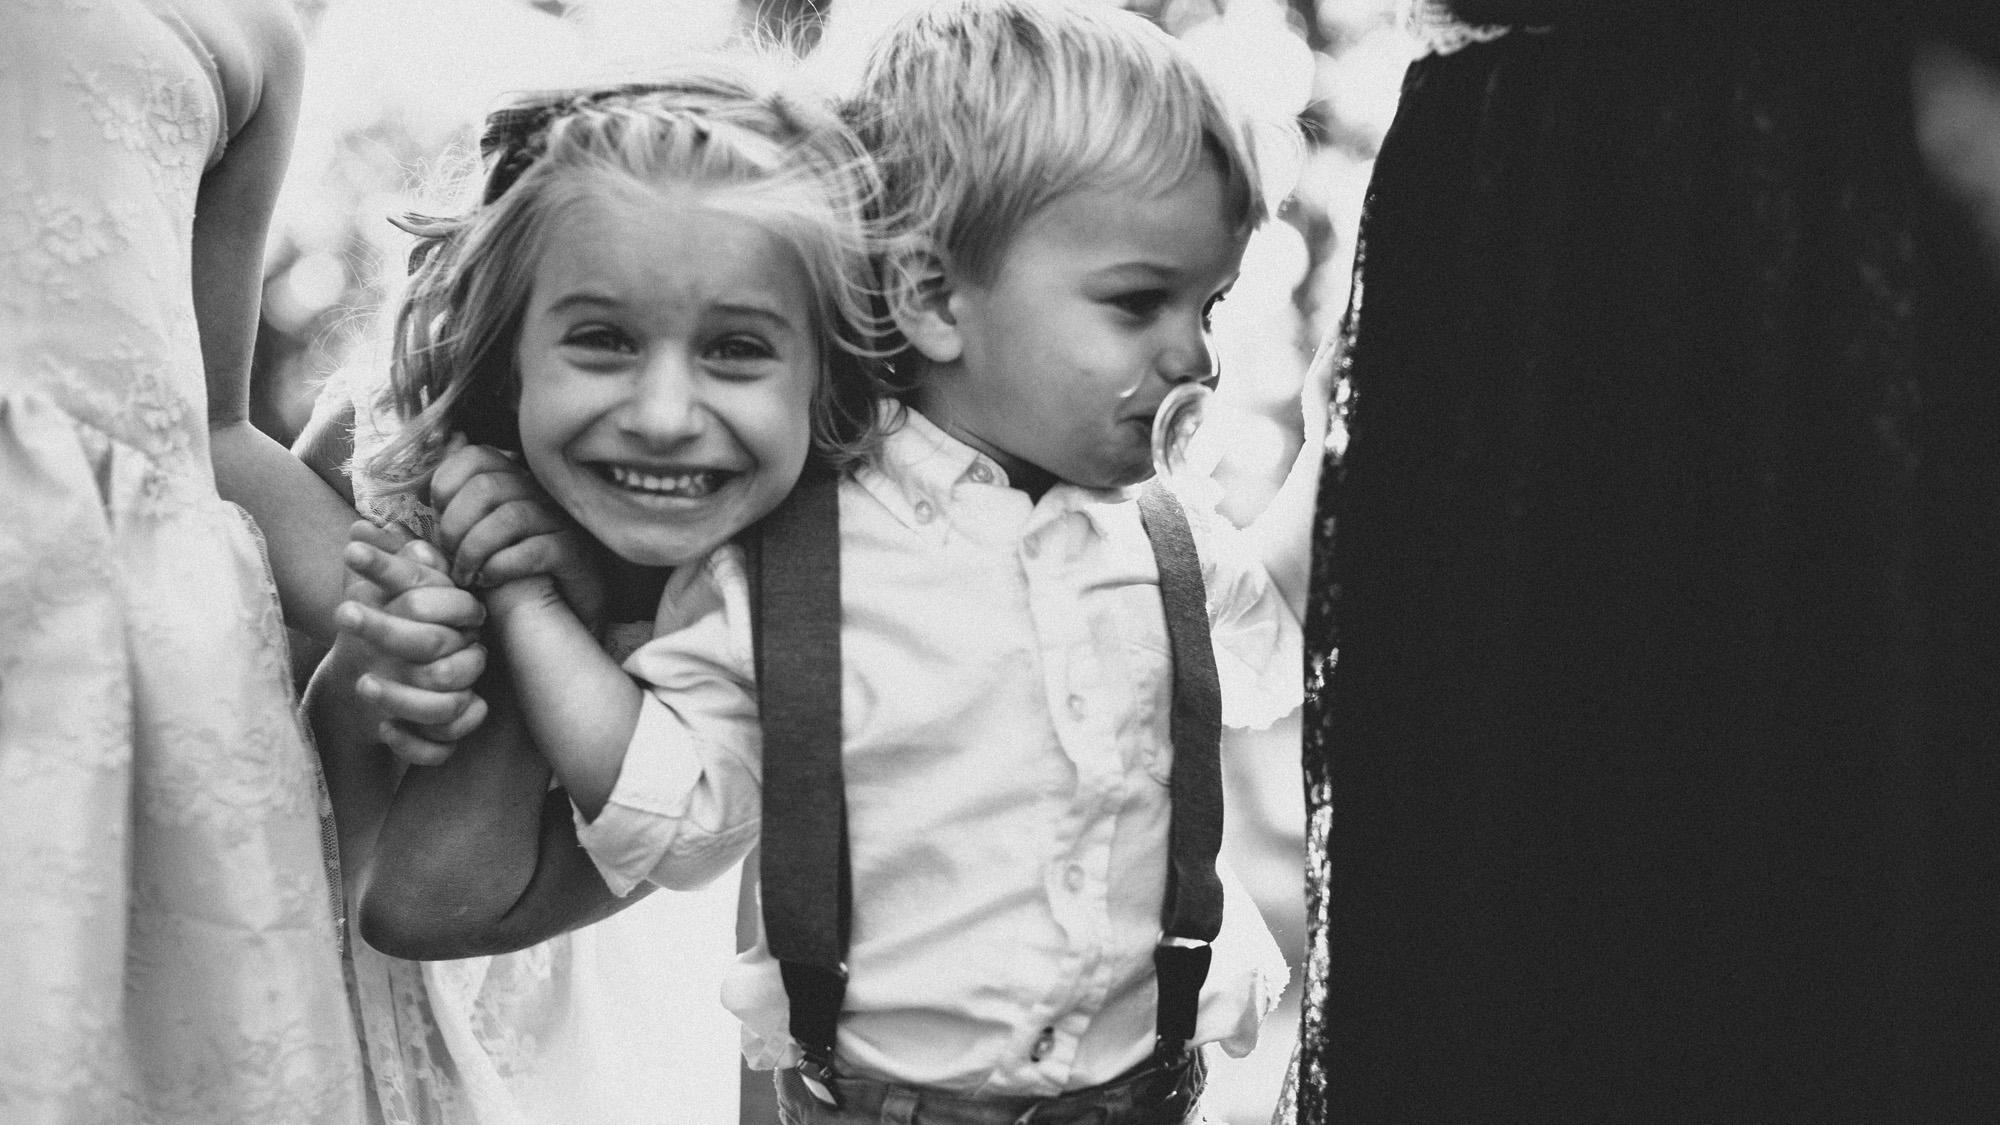 alec_vanderboom_springfield_missouri_wedding-0061.jpg